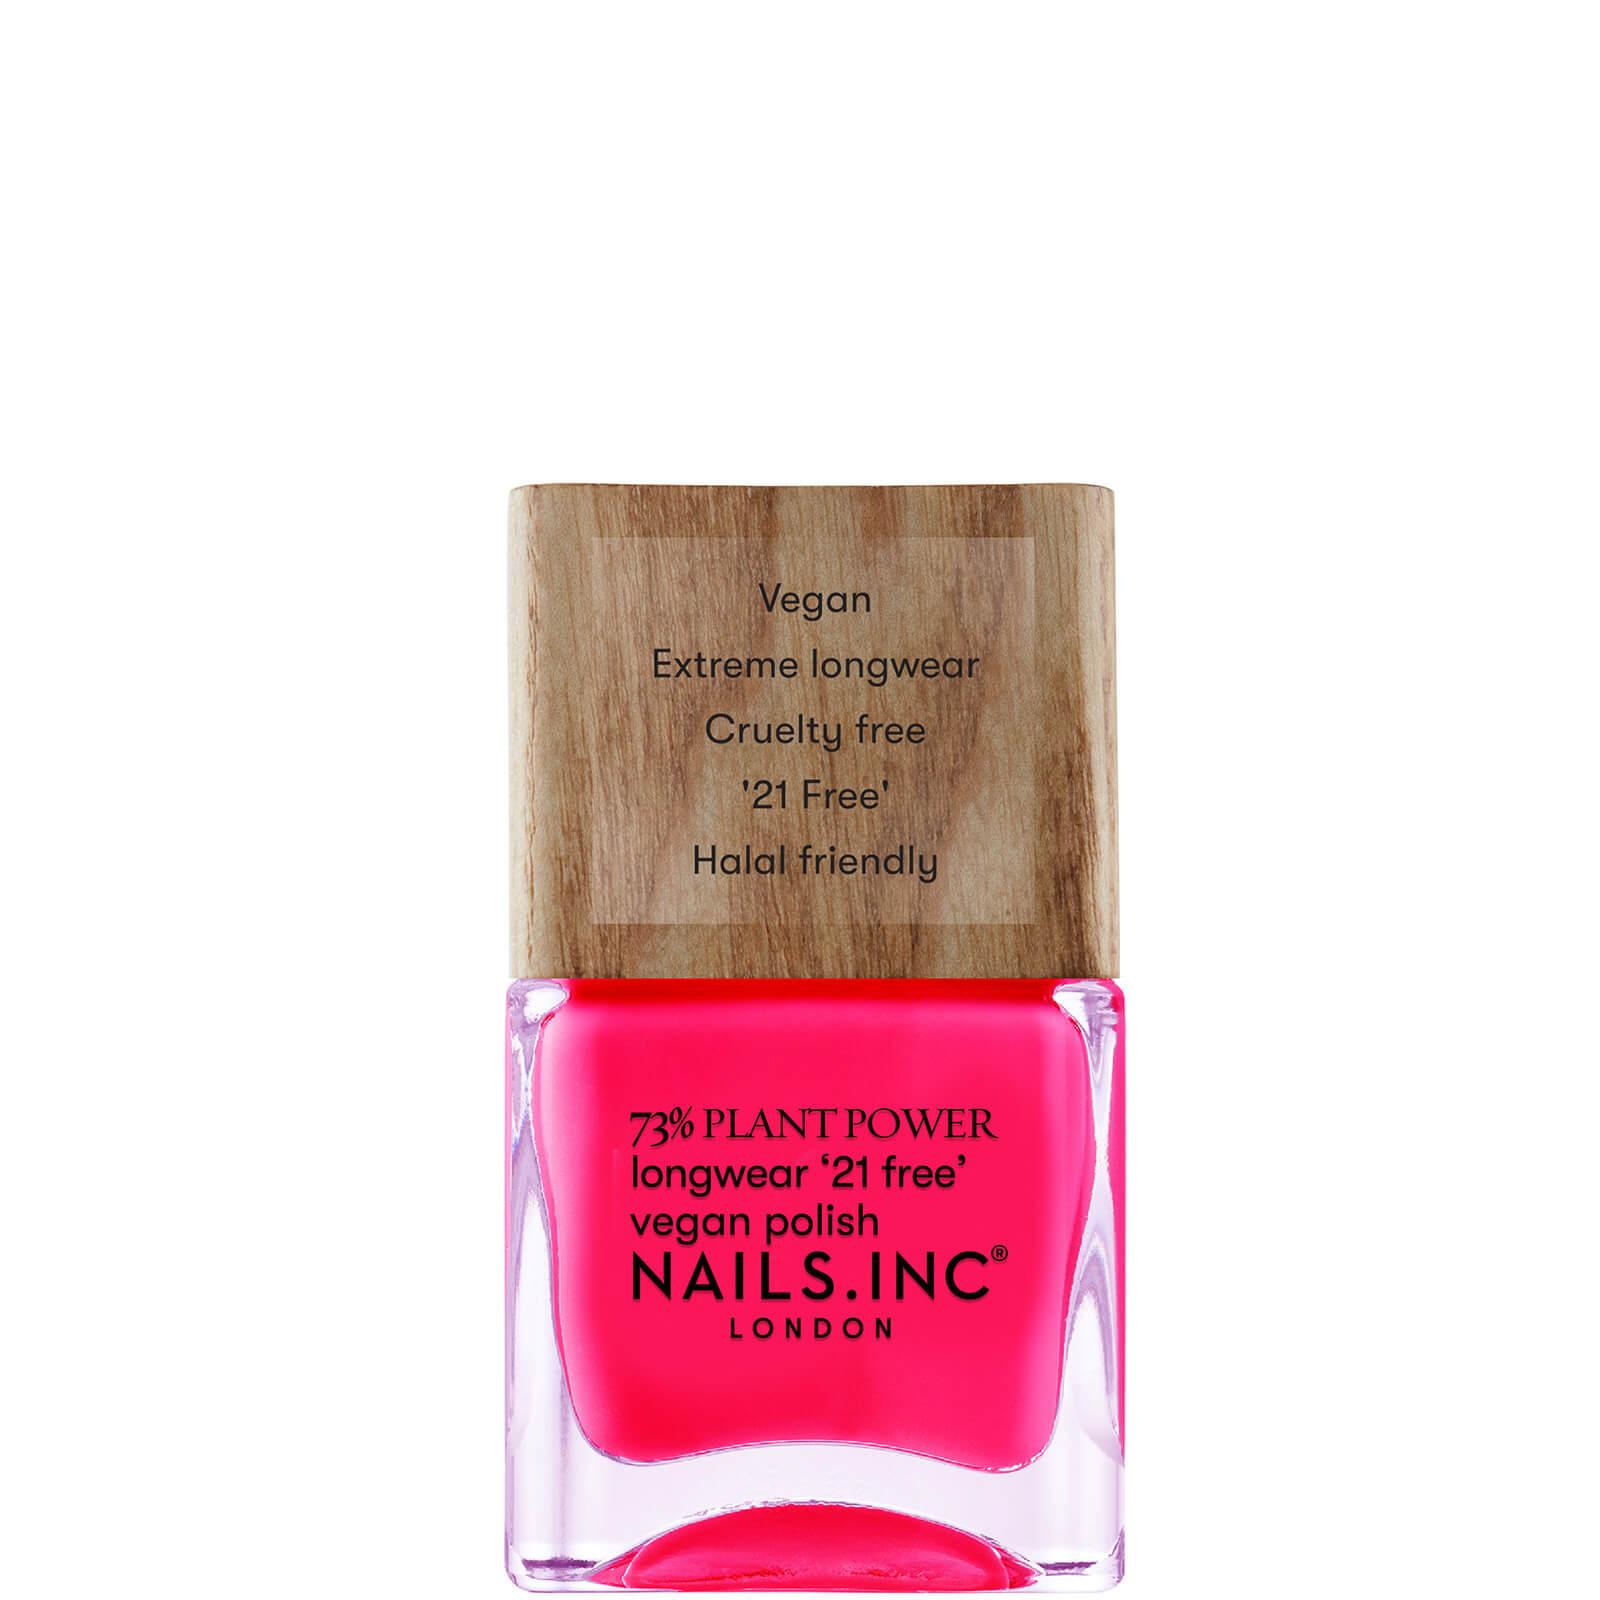 nails inc. 73% Plant Power Nail Varnish - and Breathe 14ml